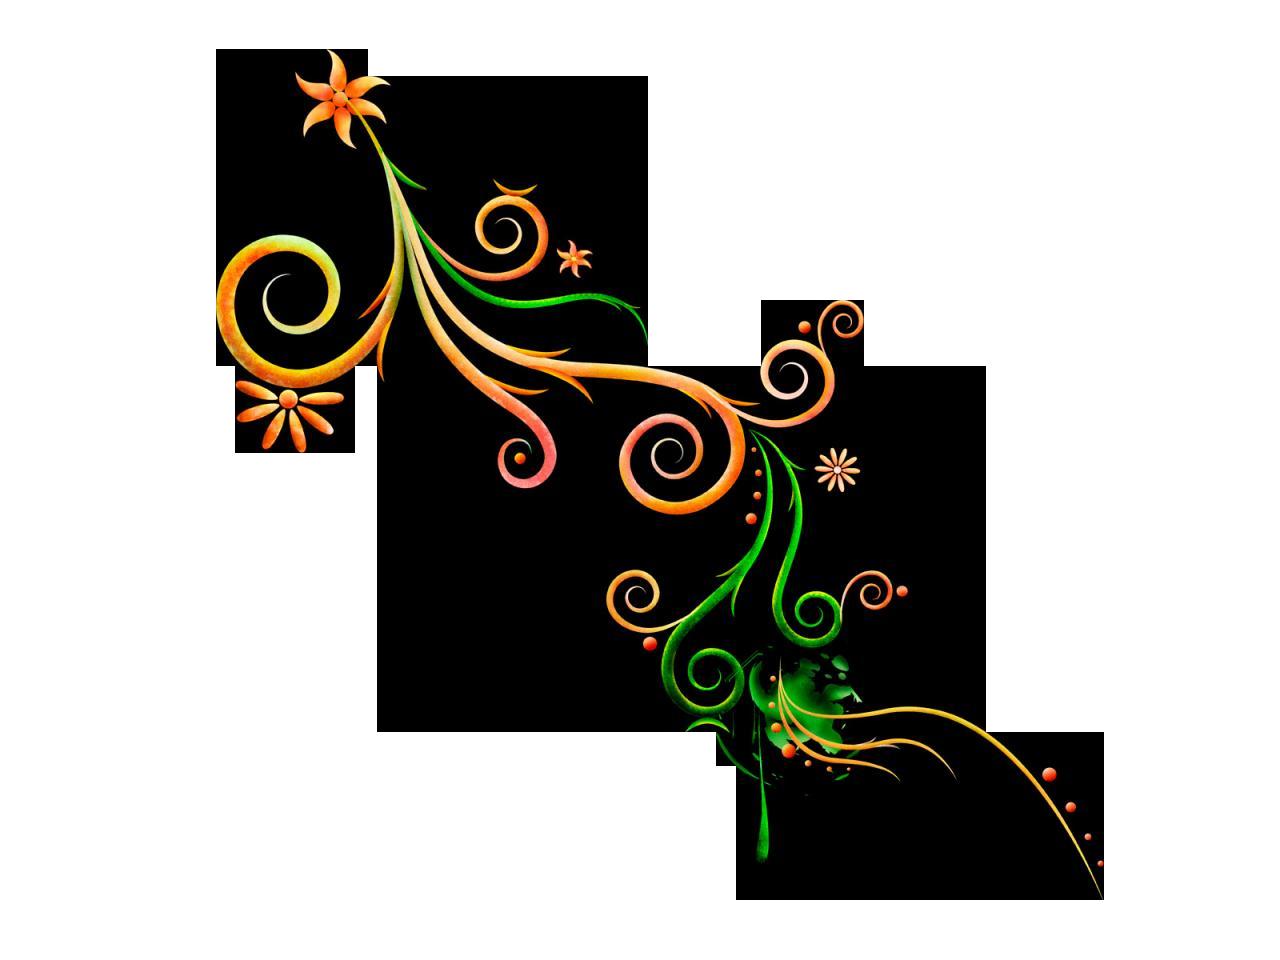 Hd Wallpaper Landscape - Design PNG HD